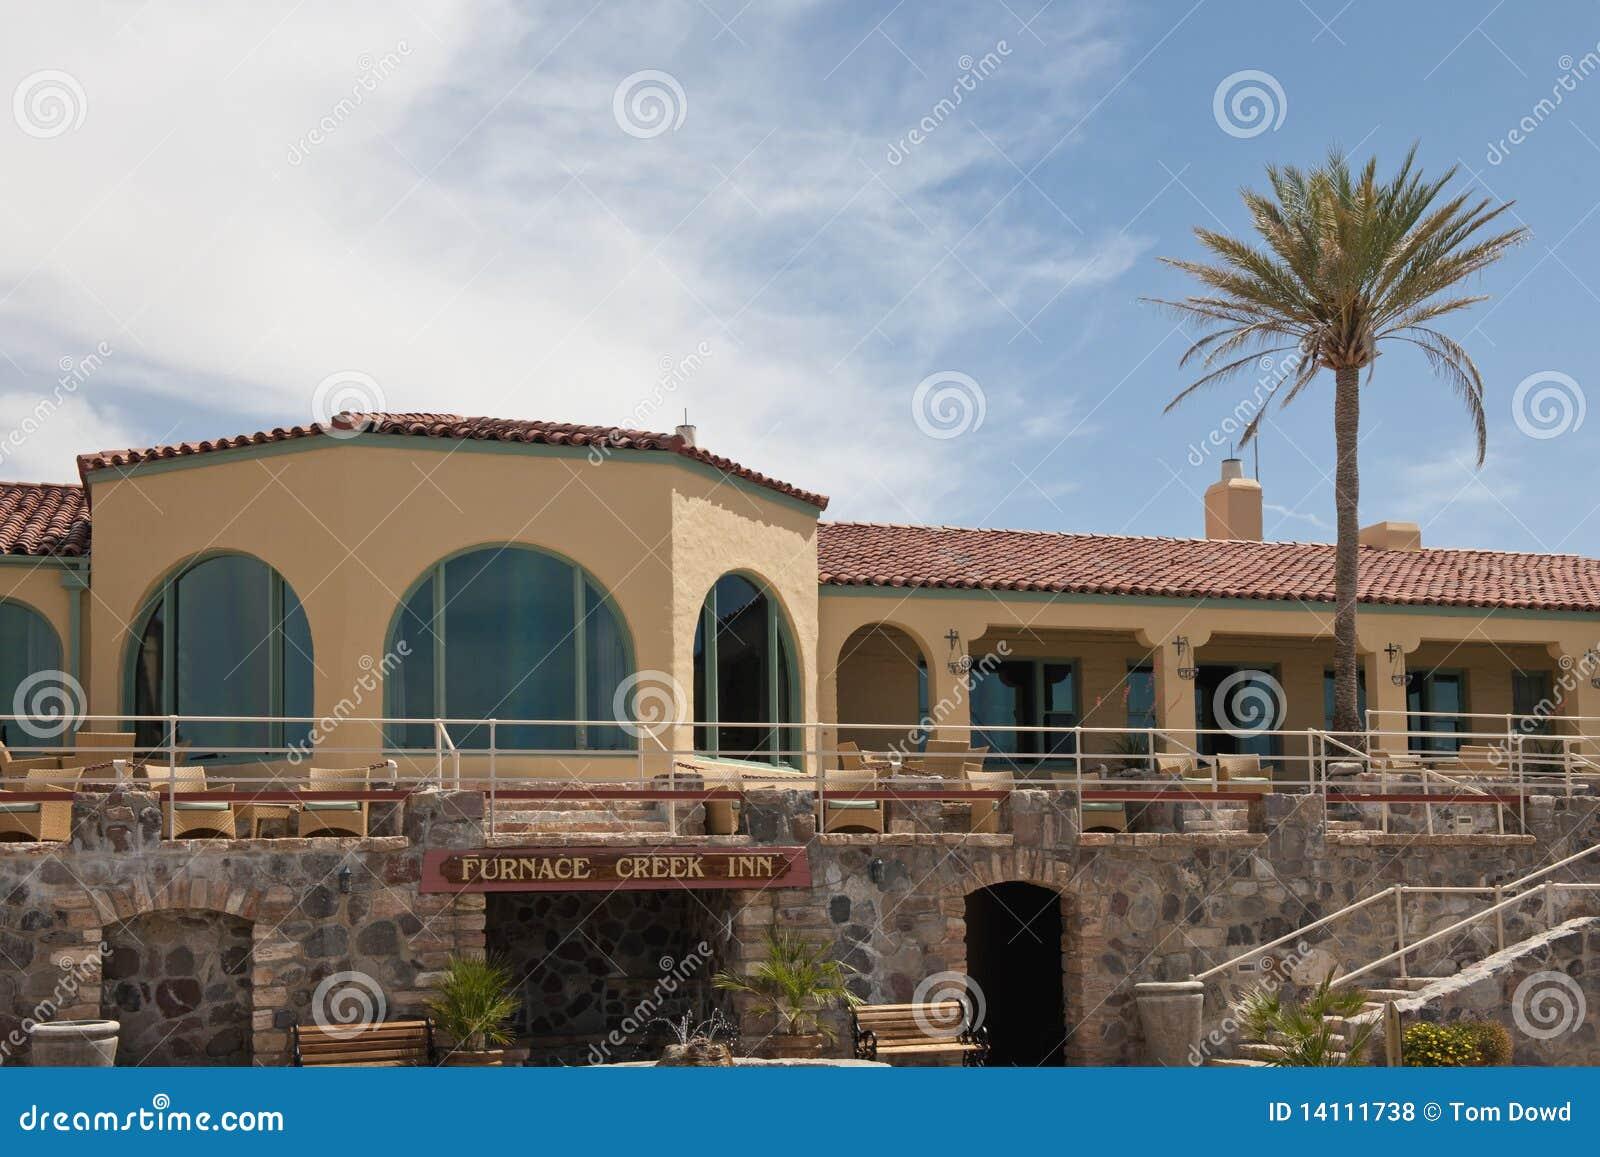 Furnace Creek Inn, California